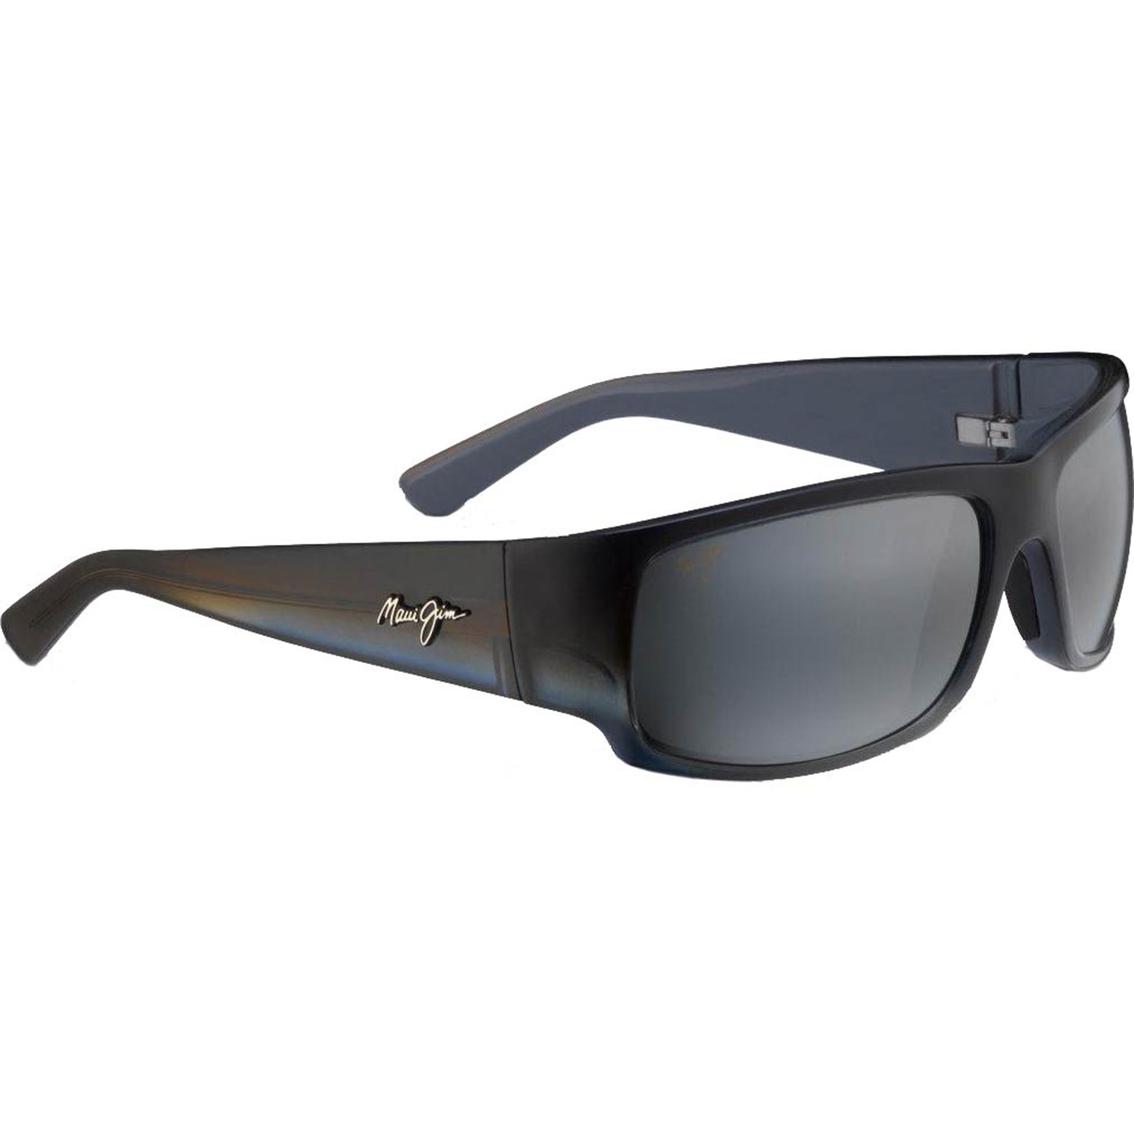 Maui And Sons Sunglasses  maui jim world cup sunglasses uni apparel the exchange